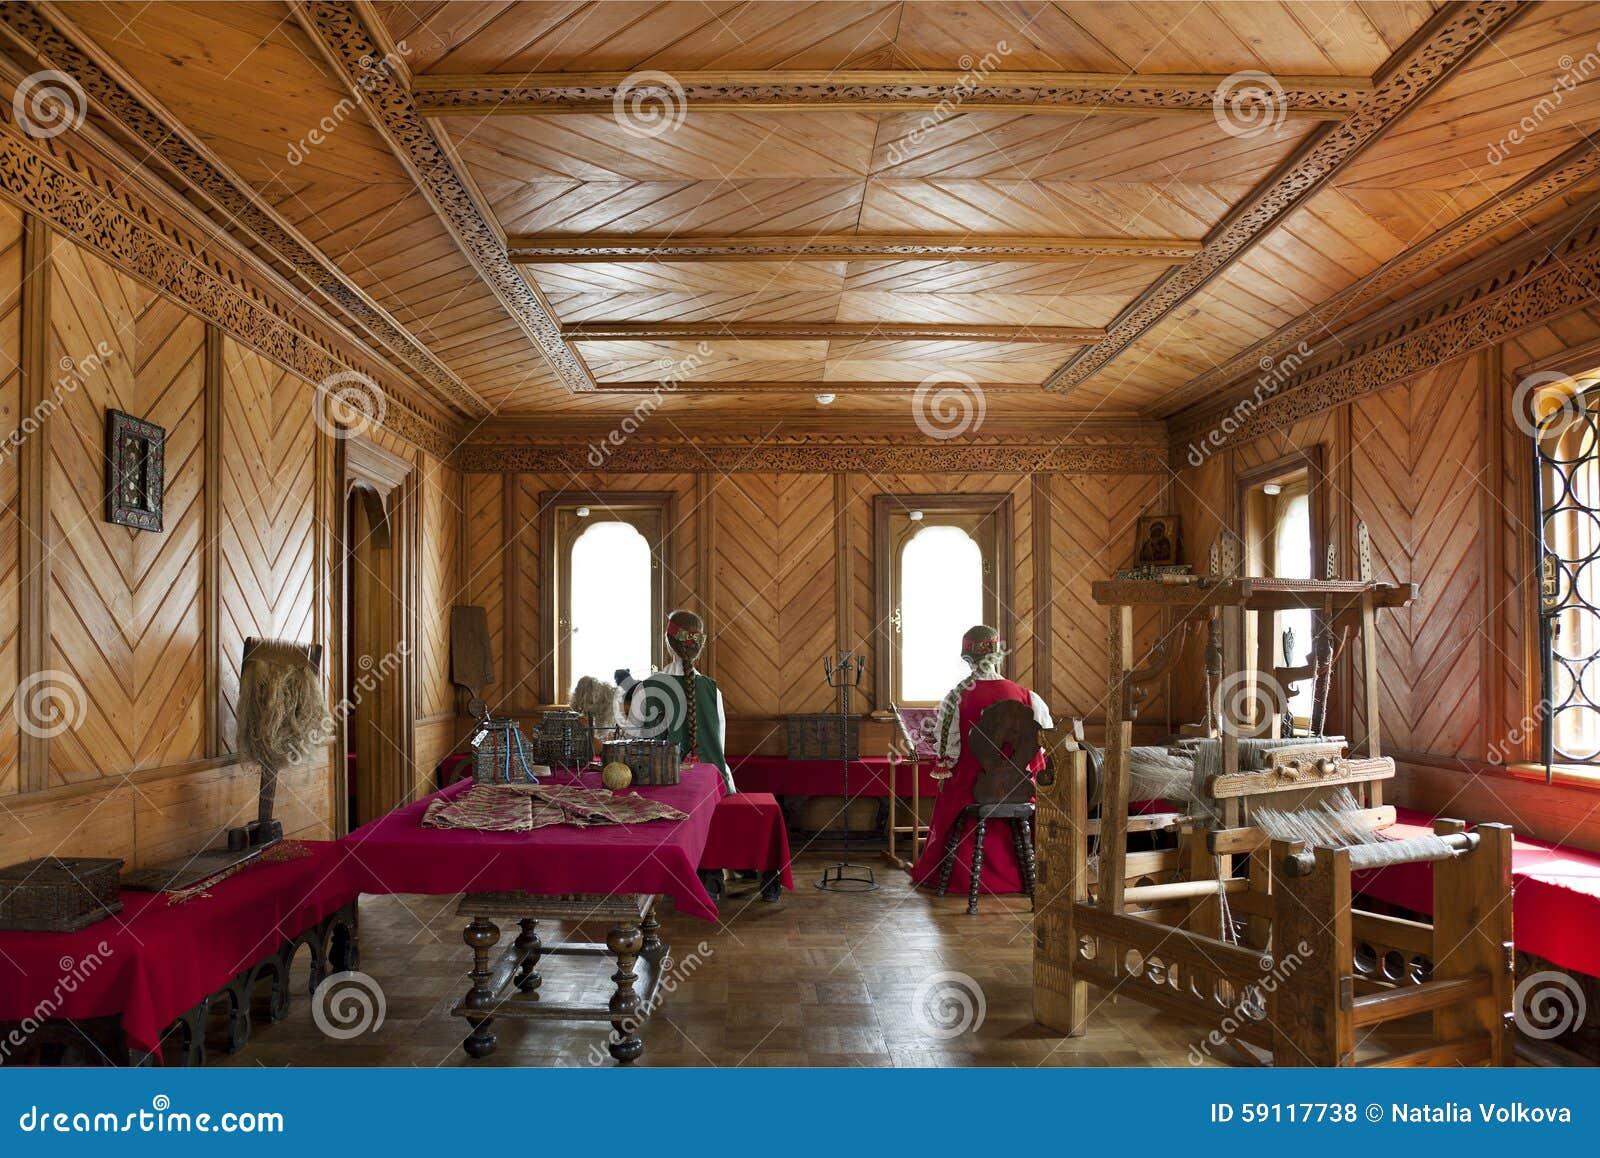 traditional home interior russian aristocracy editorial stock